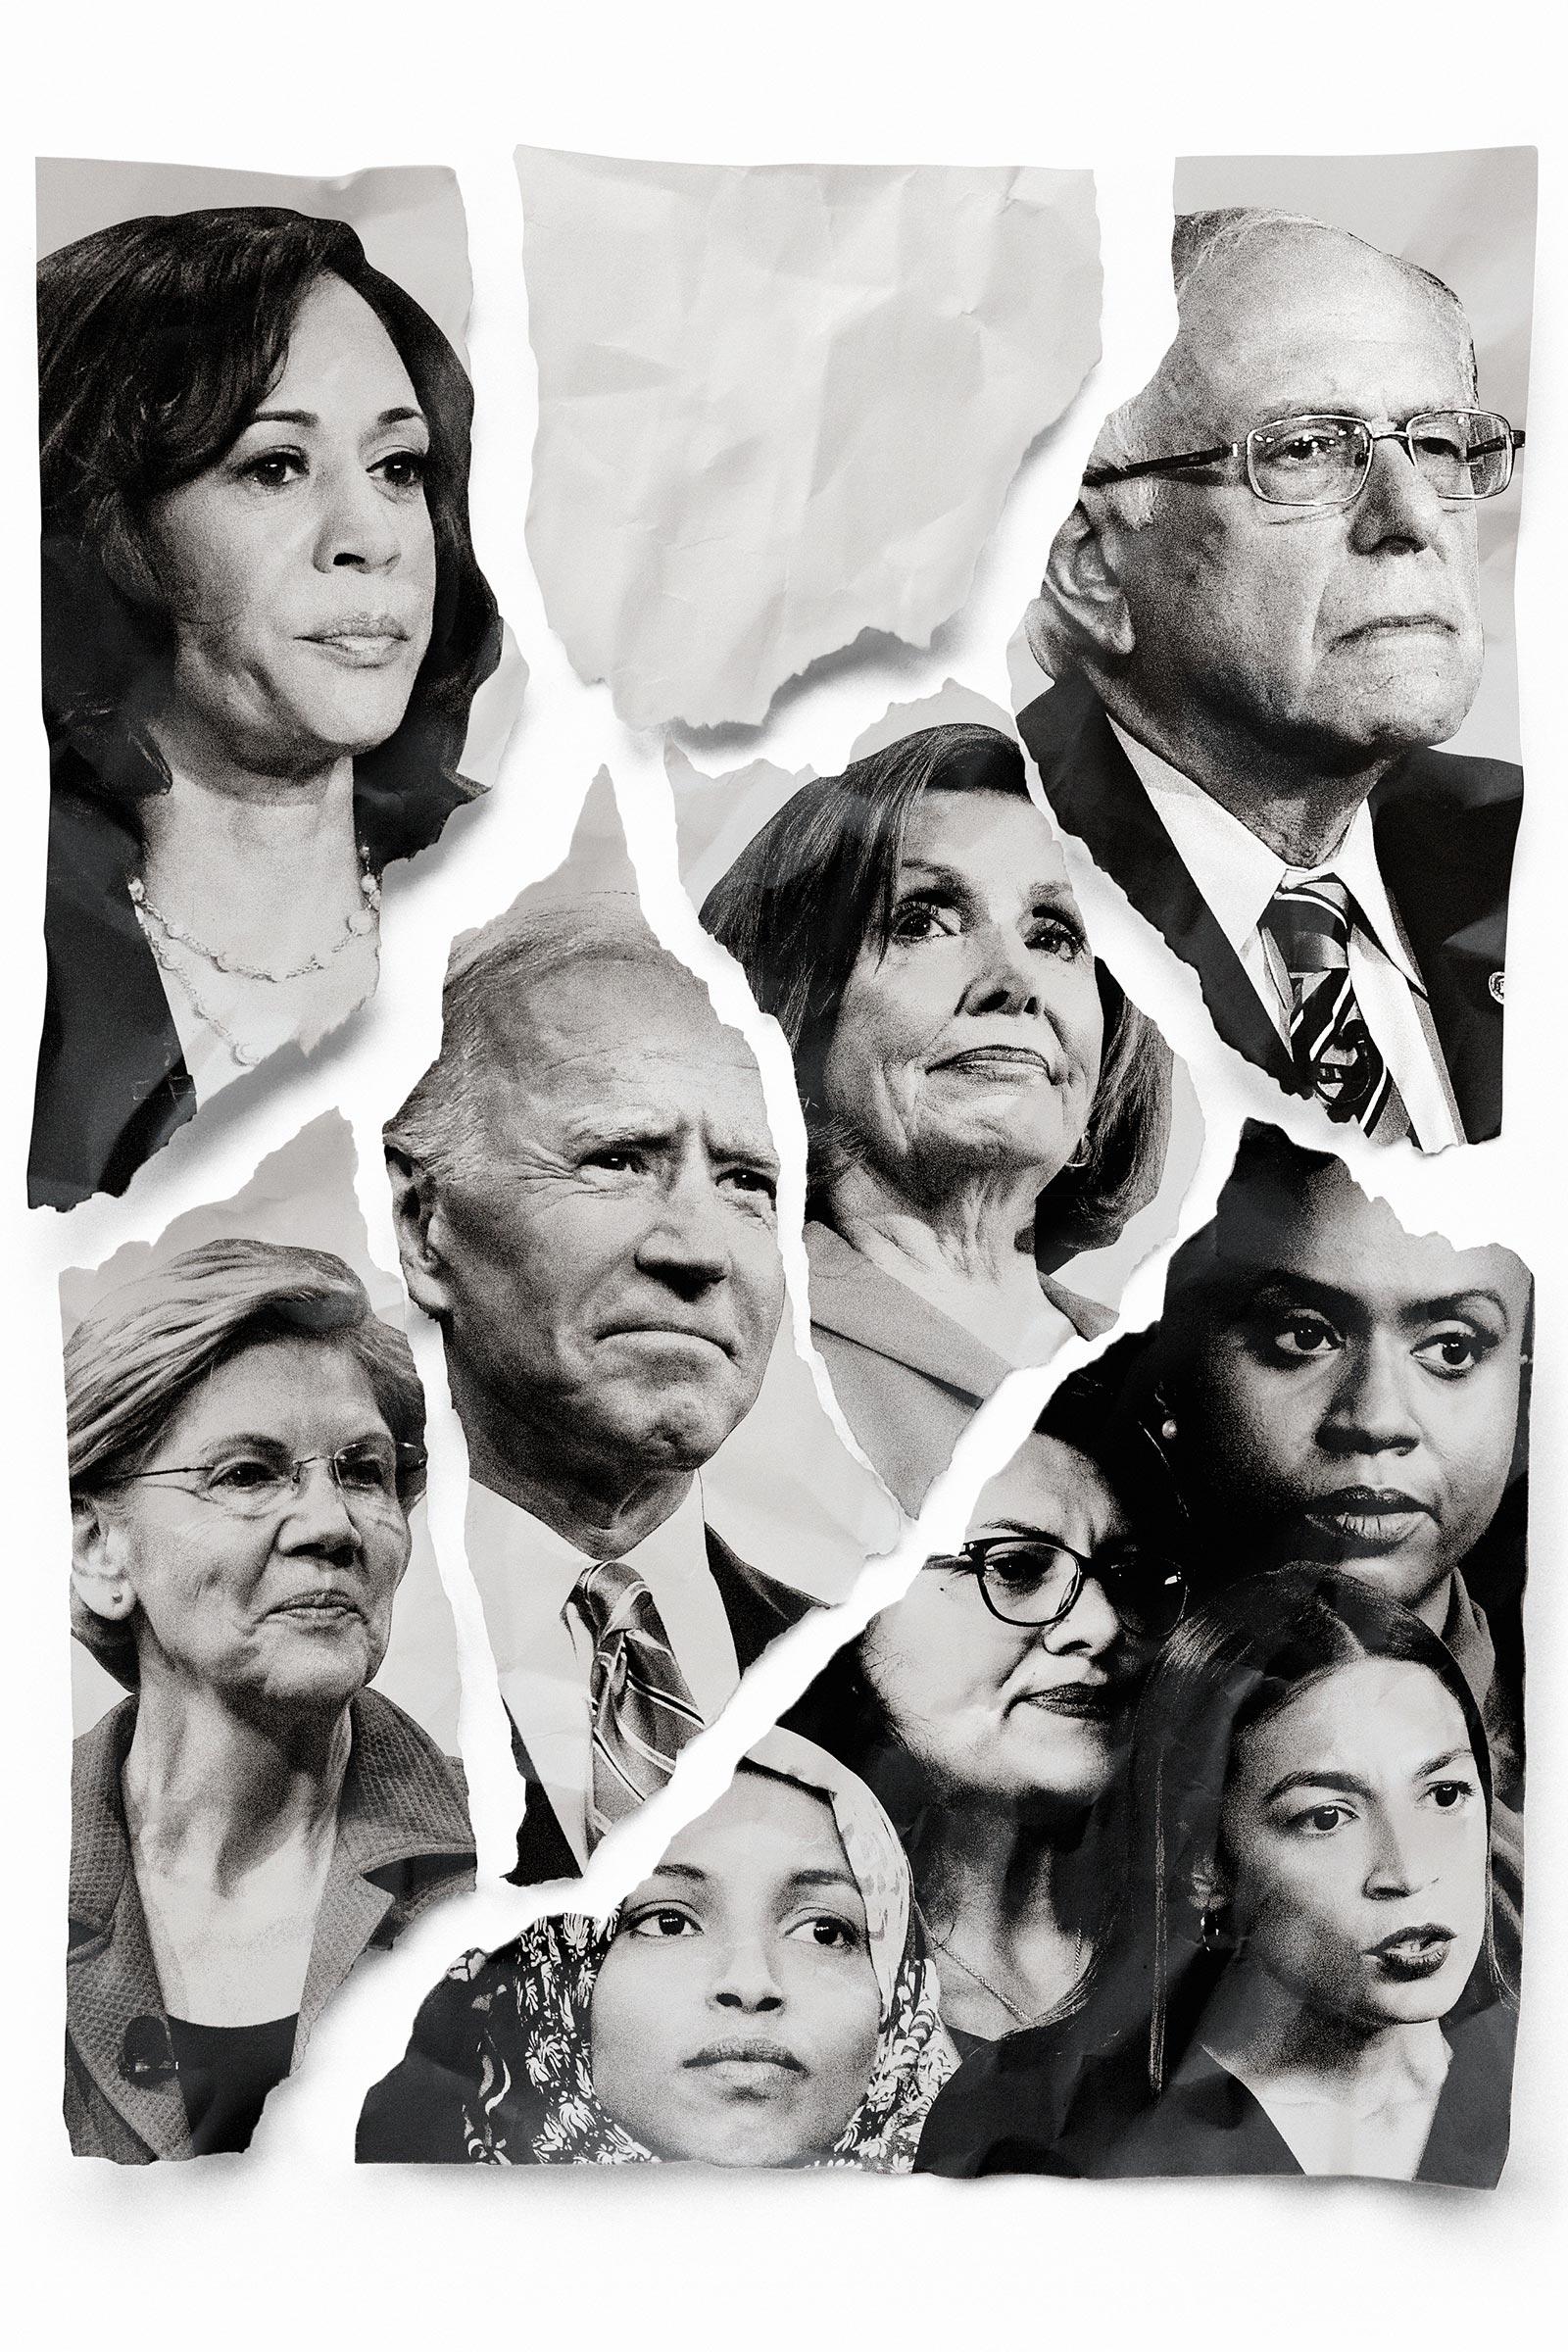 Clockwise from top left: Kamala Harris, Bernie Sanders, Ayanna Pressley, Alexandria Ocasio-Cortez, Rashida Tlaib, Ilhan Omar, Elizabeth Warren, Joe Biden, Nancy Pelosi.